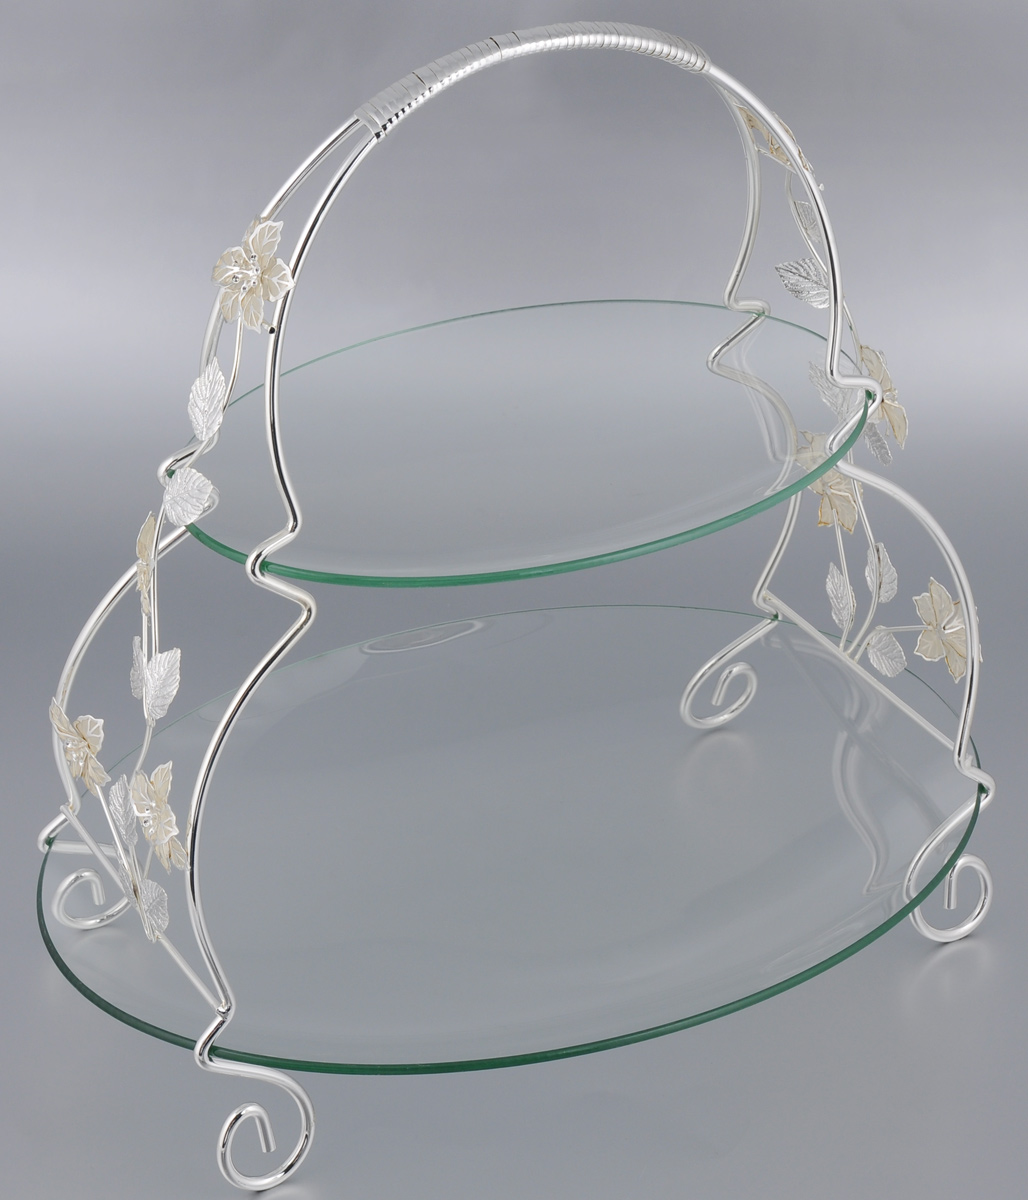 Ваза универсальная Marquis, 2 яруса. 3101-MR ваза керамическая 20 х 11 х 41 см